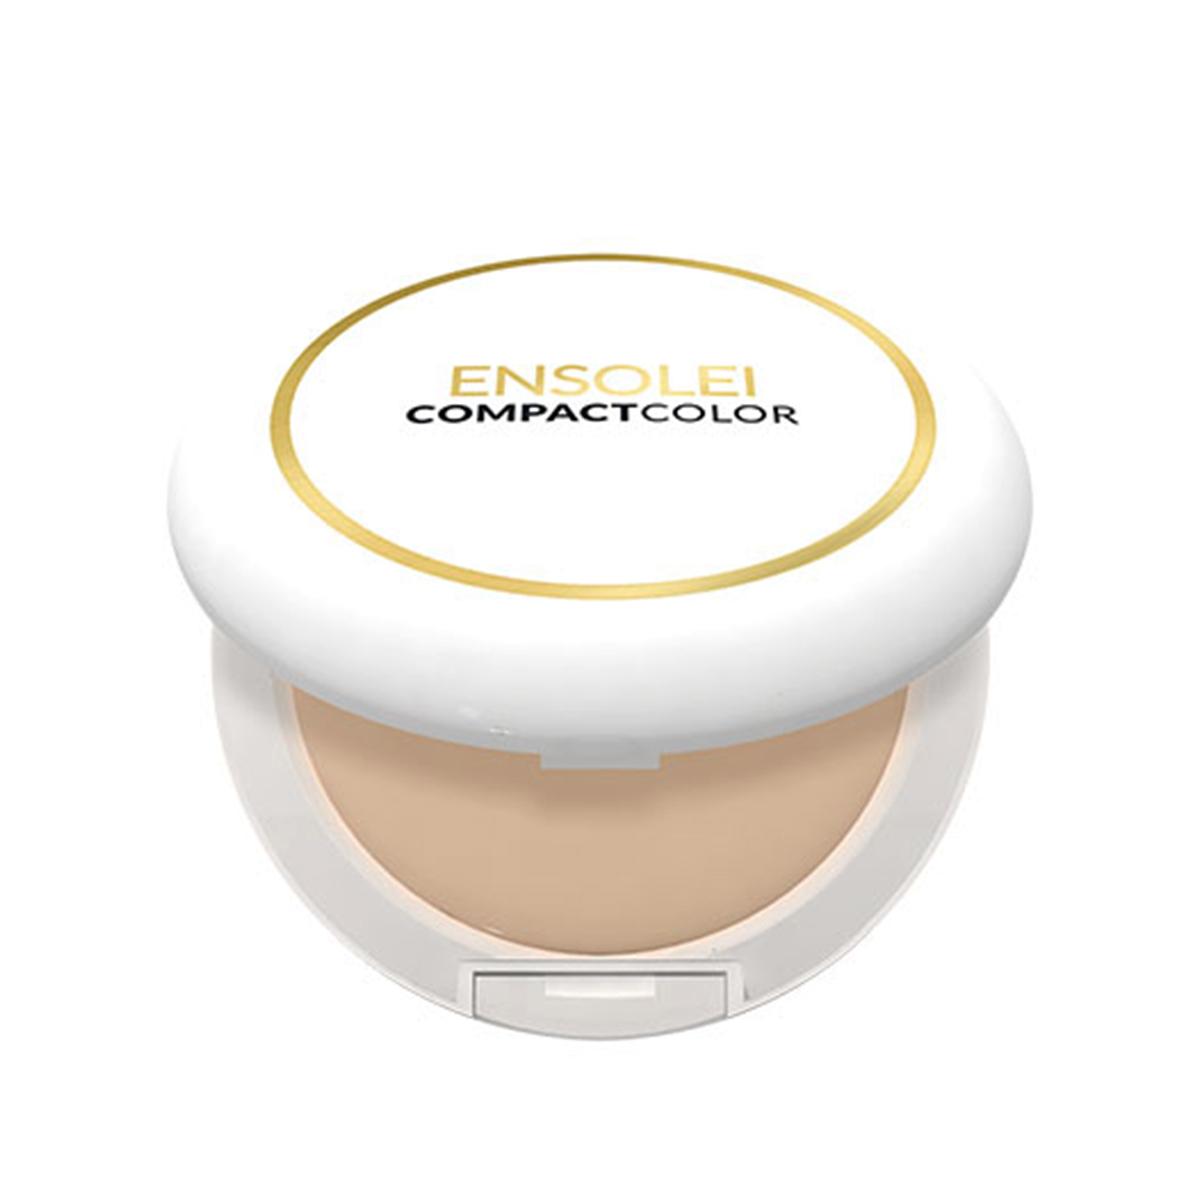 Base Facial Compacta Profuse Ensolei CompactColor FPS 50 com 10g 10g